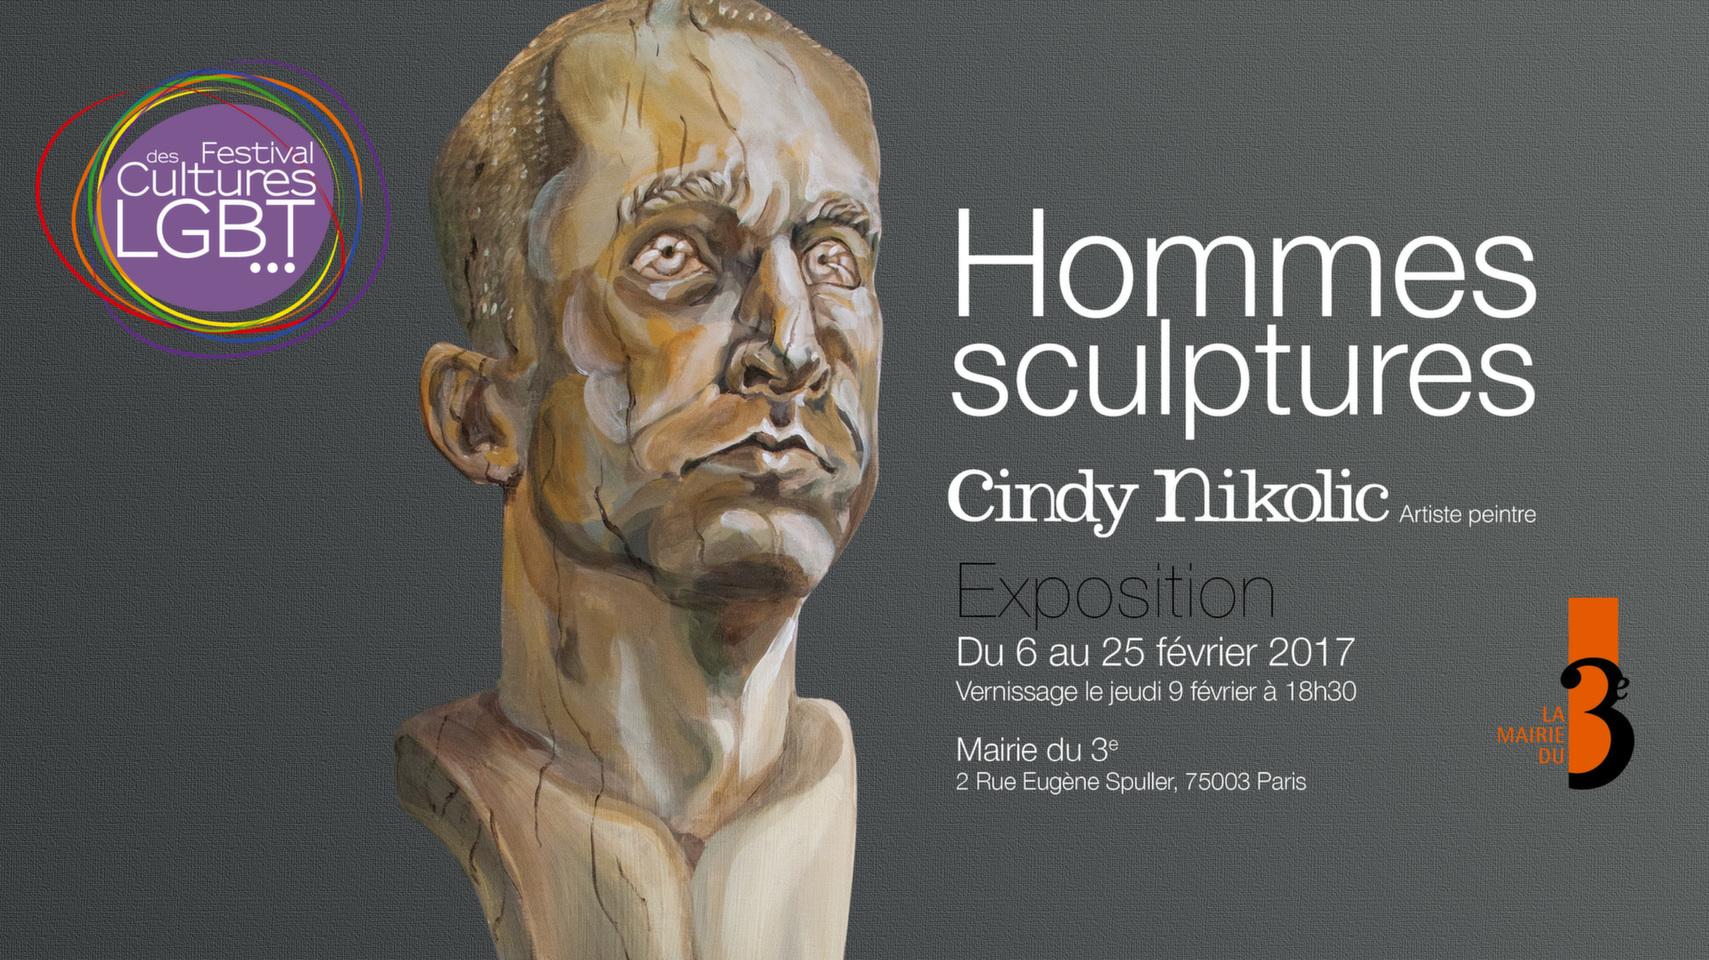 hommessculptures_couv_facebook_Festival_LGBT-expo